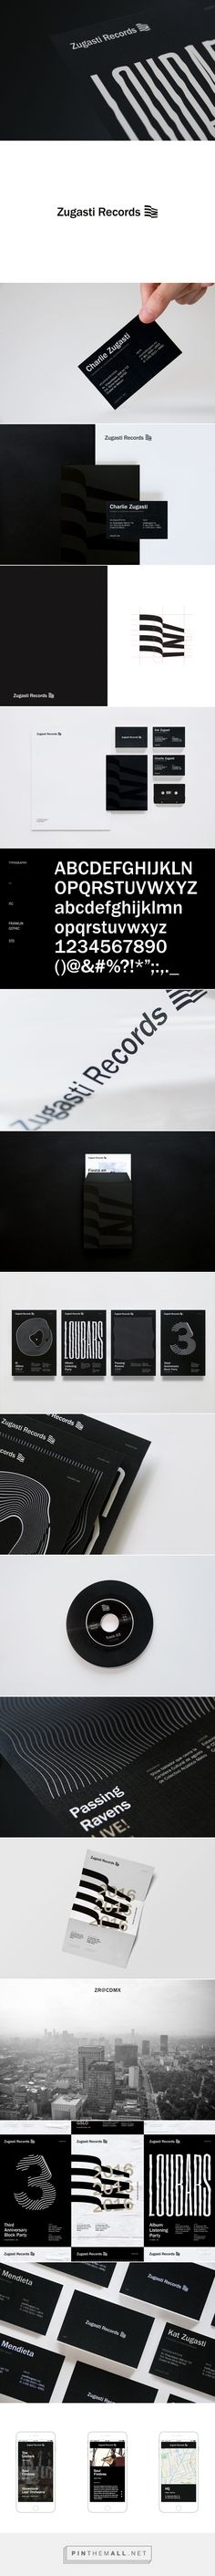 Zugasti Records on Behance - created via https://pinthemall.net